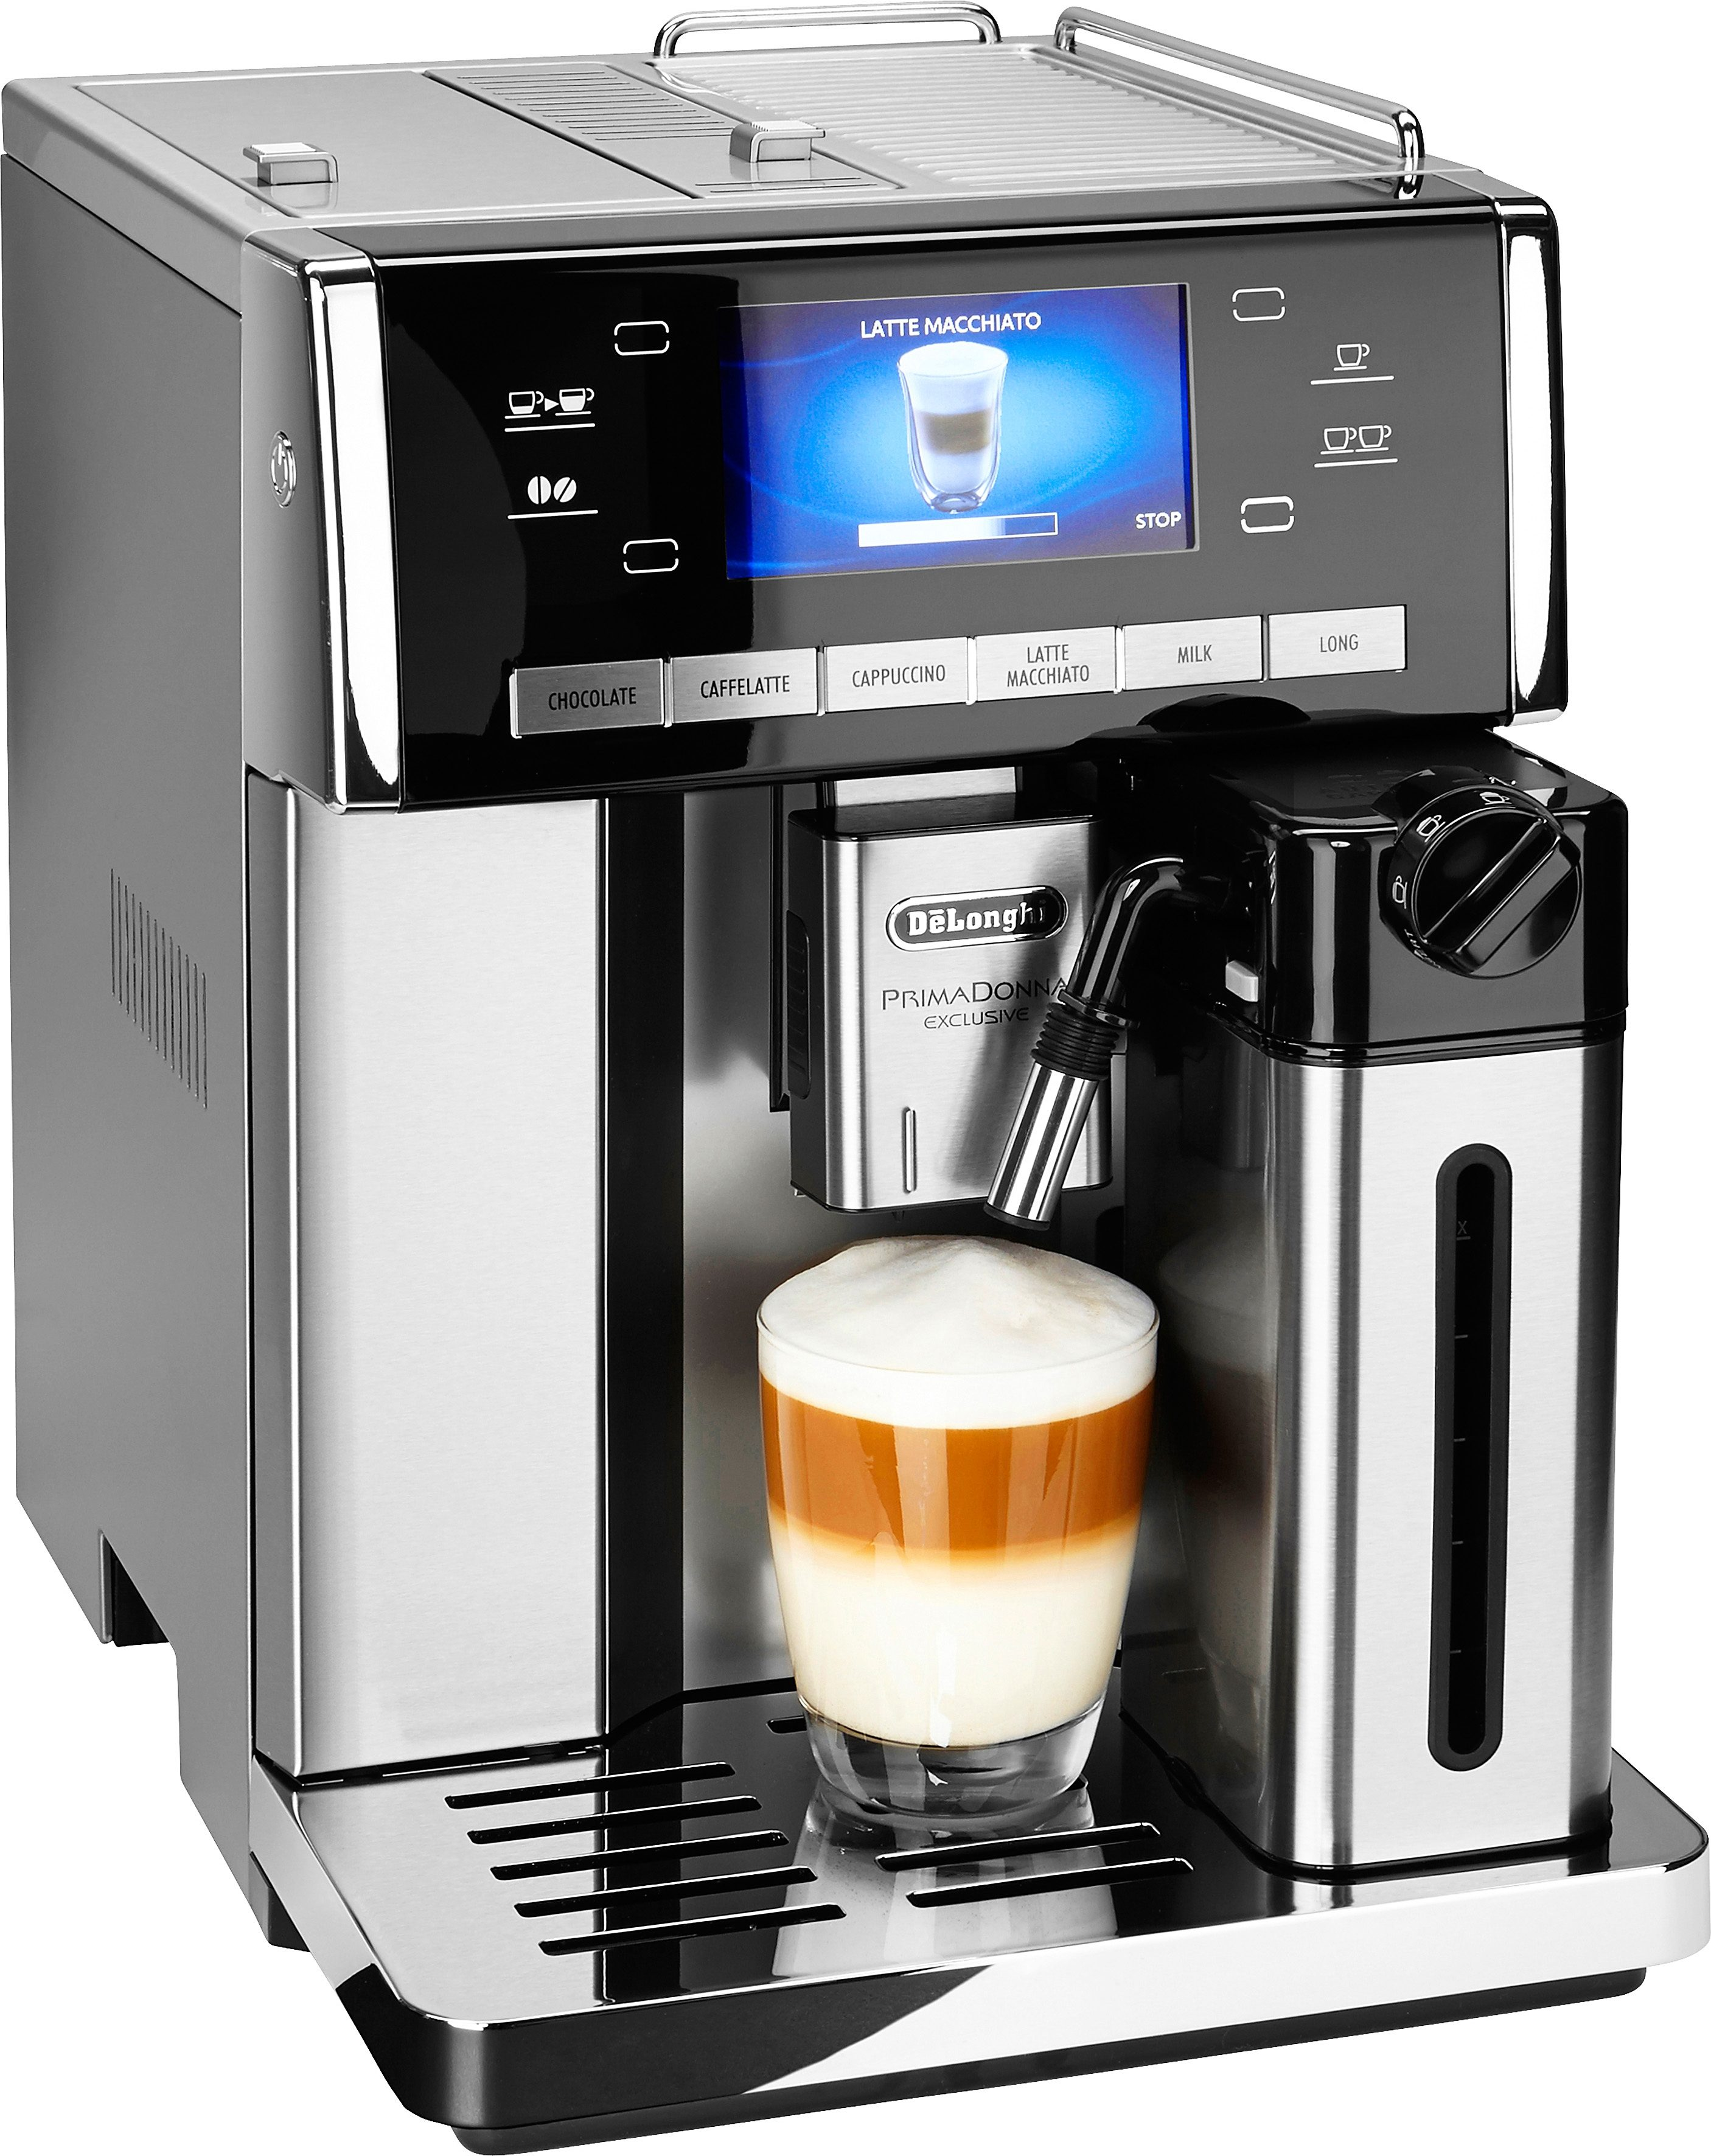 De´Longhi Kaffeevollautomat PrimaDonna Exclusive ESAM 6900.M, 1,4l Tank, Kegelmahlwerk | Küche und Esszimmer > Kaffee und Tee > Kaffeevollautomaten | Silberfarben | DELONGHI